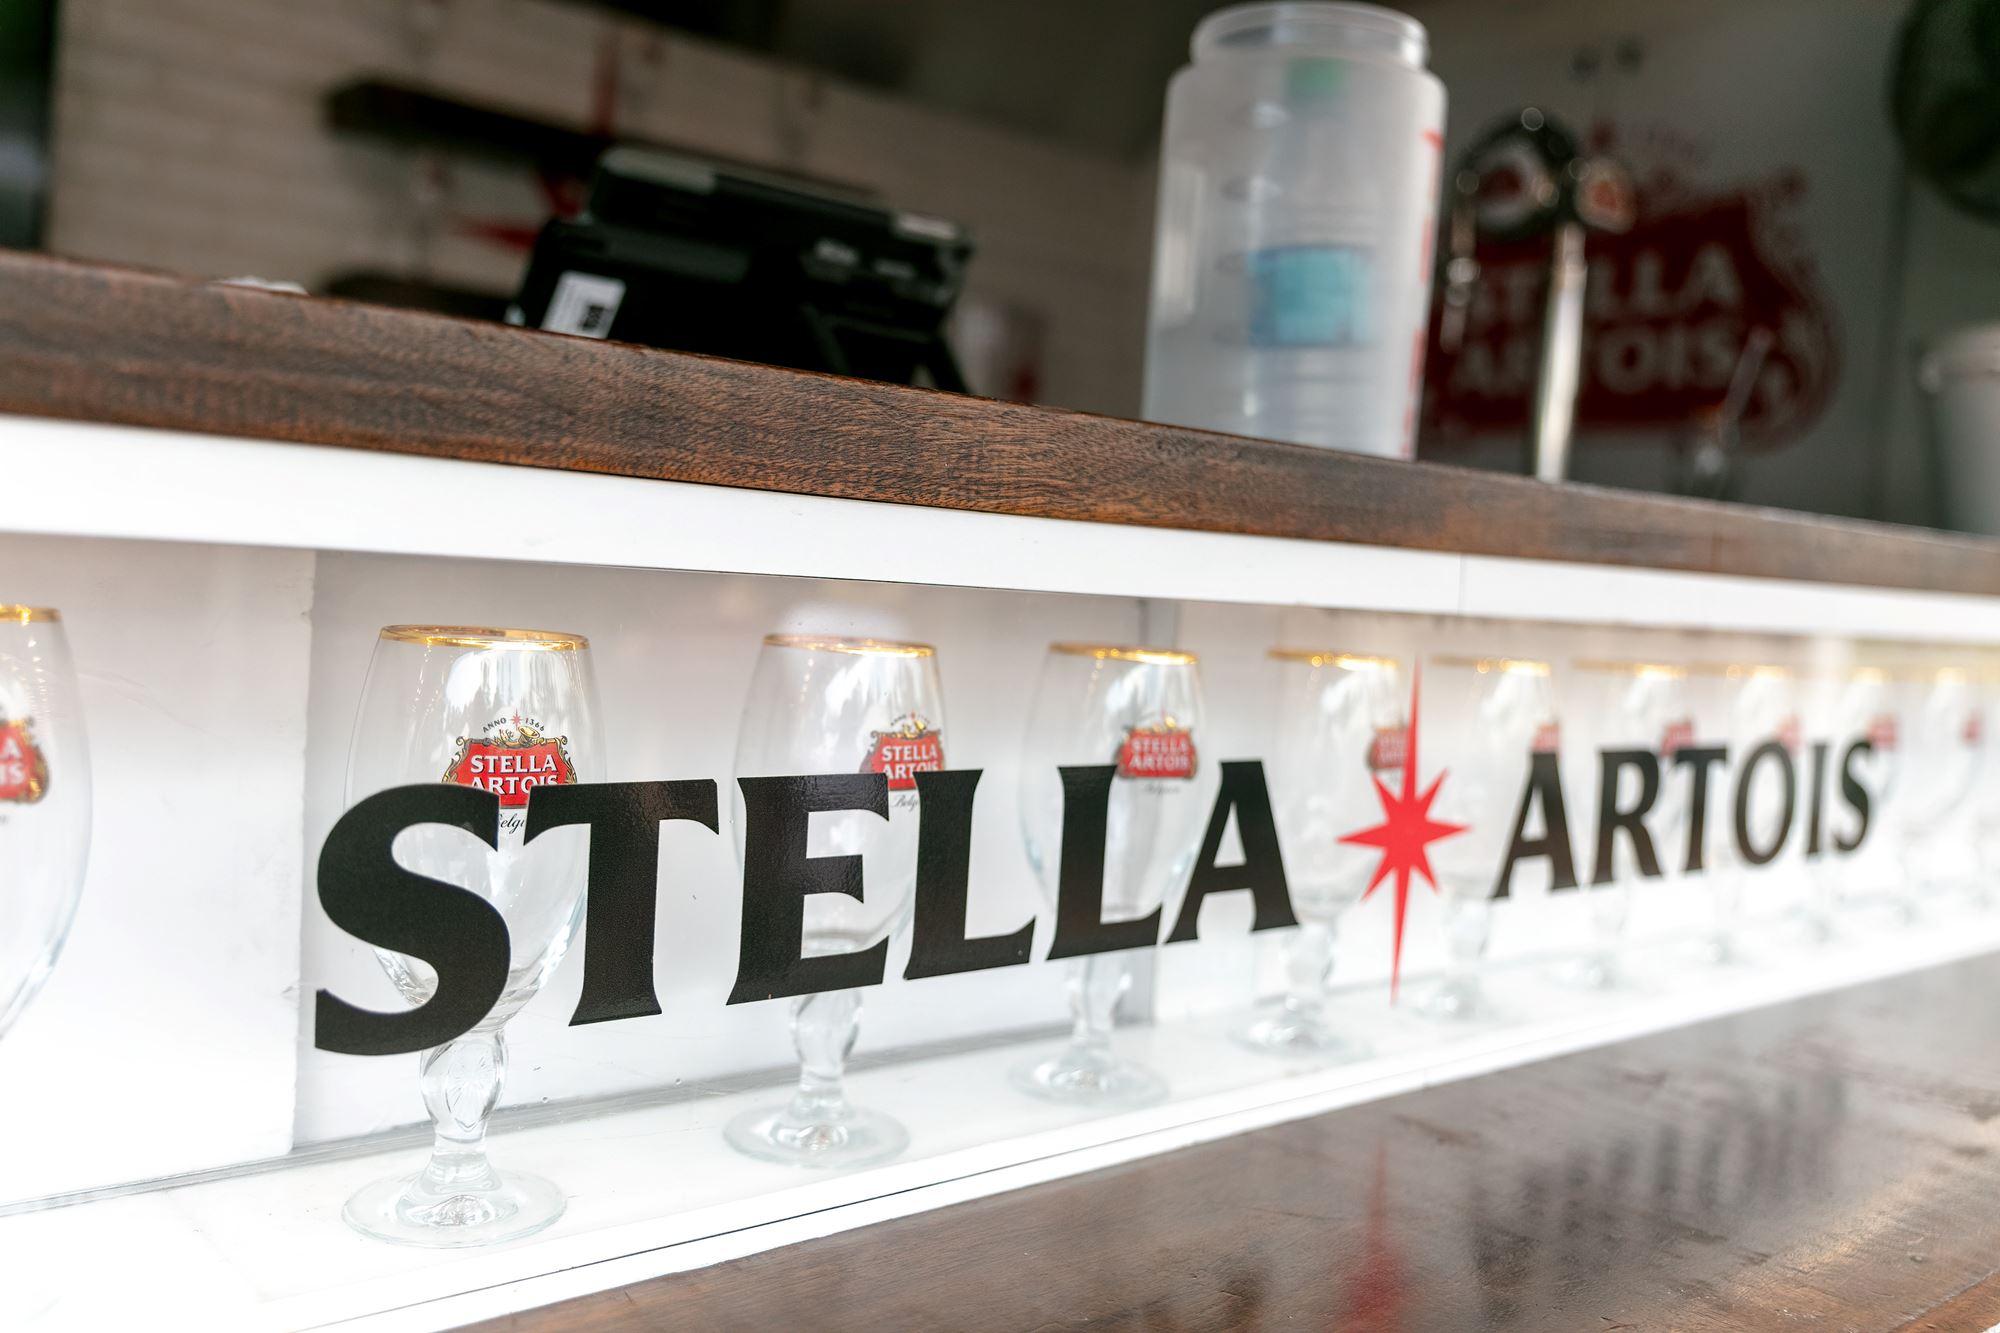 Stella Artois signage on the bar